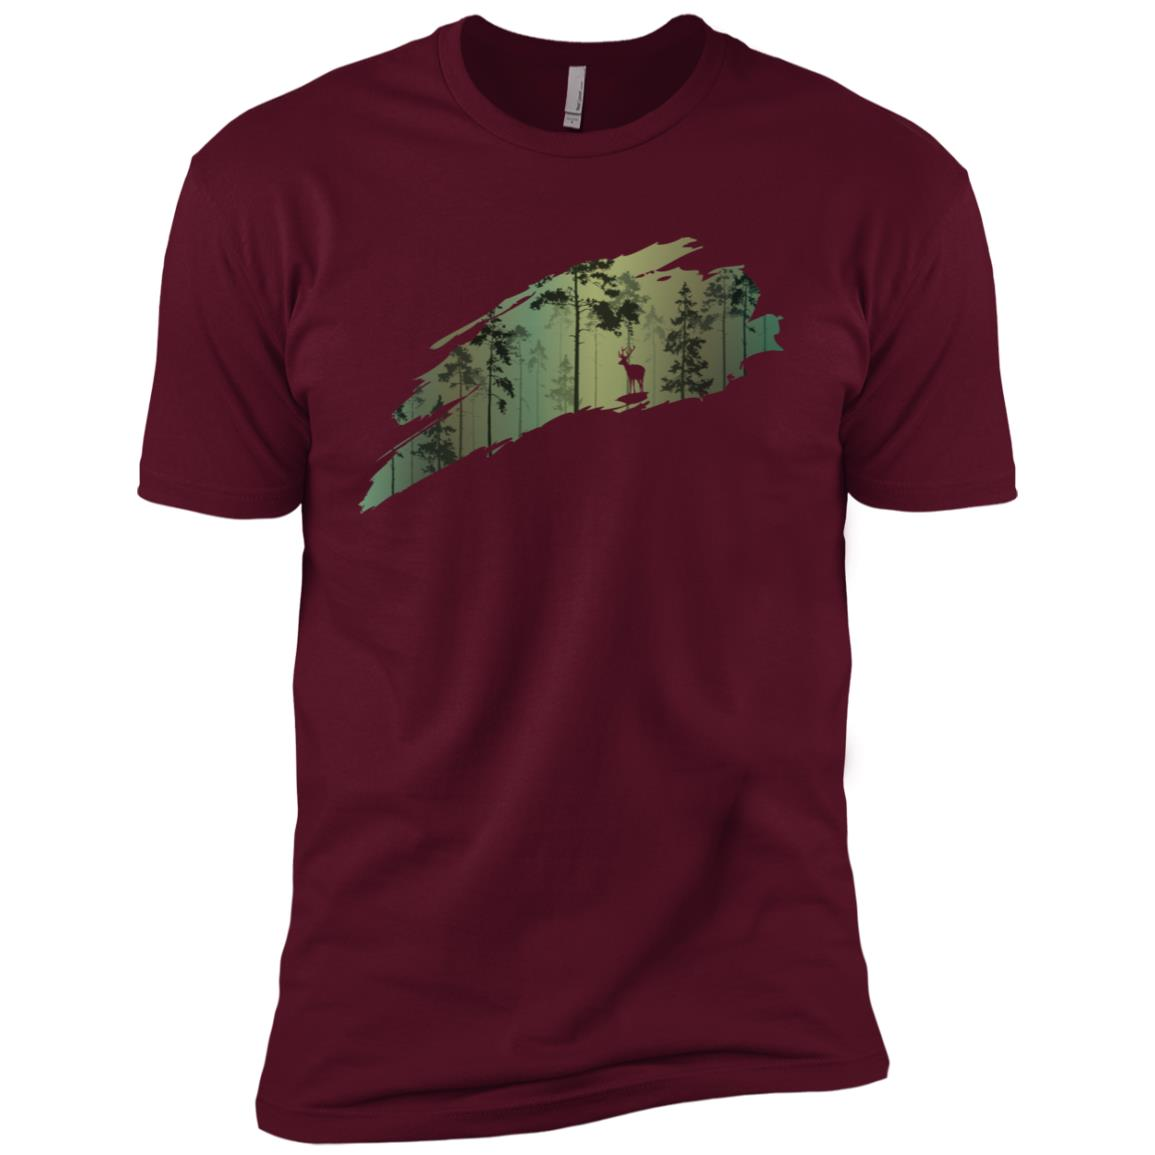 Deer Hunting Men Short Sleeve T-Shirt